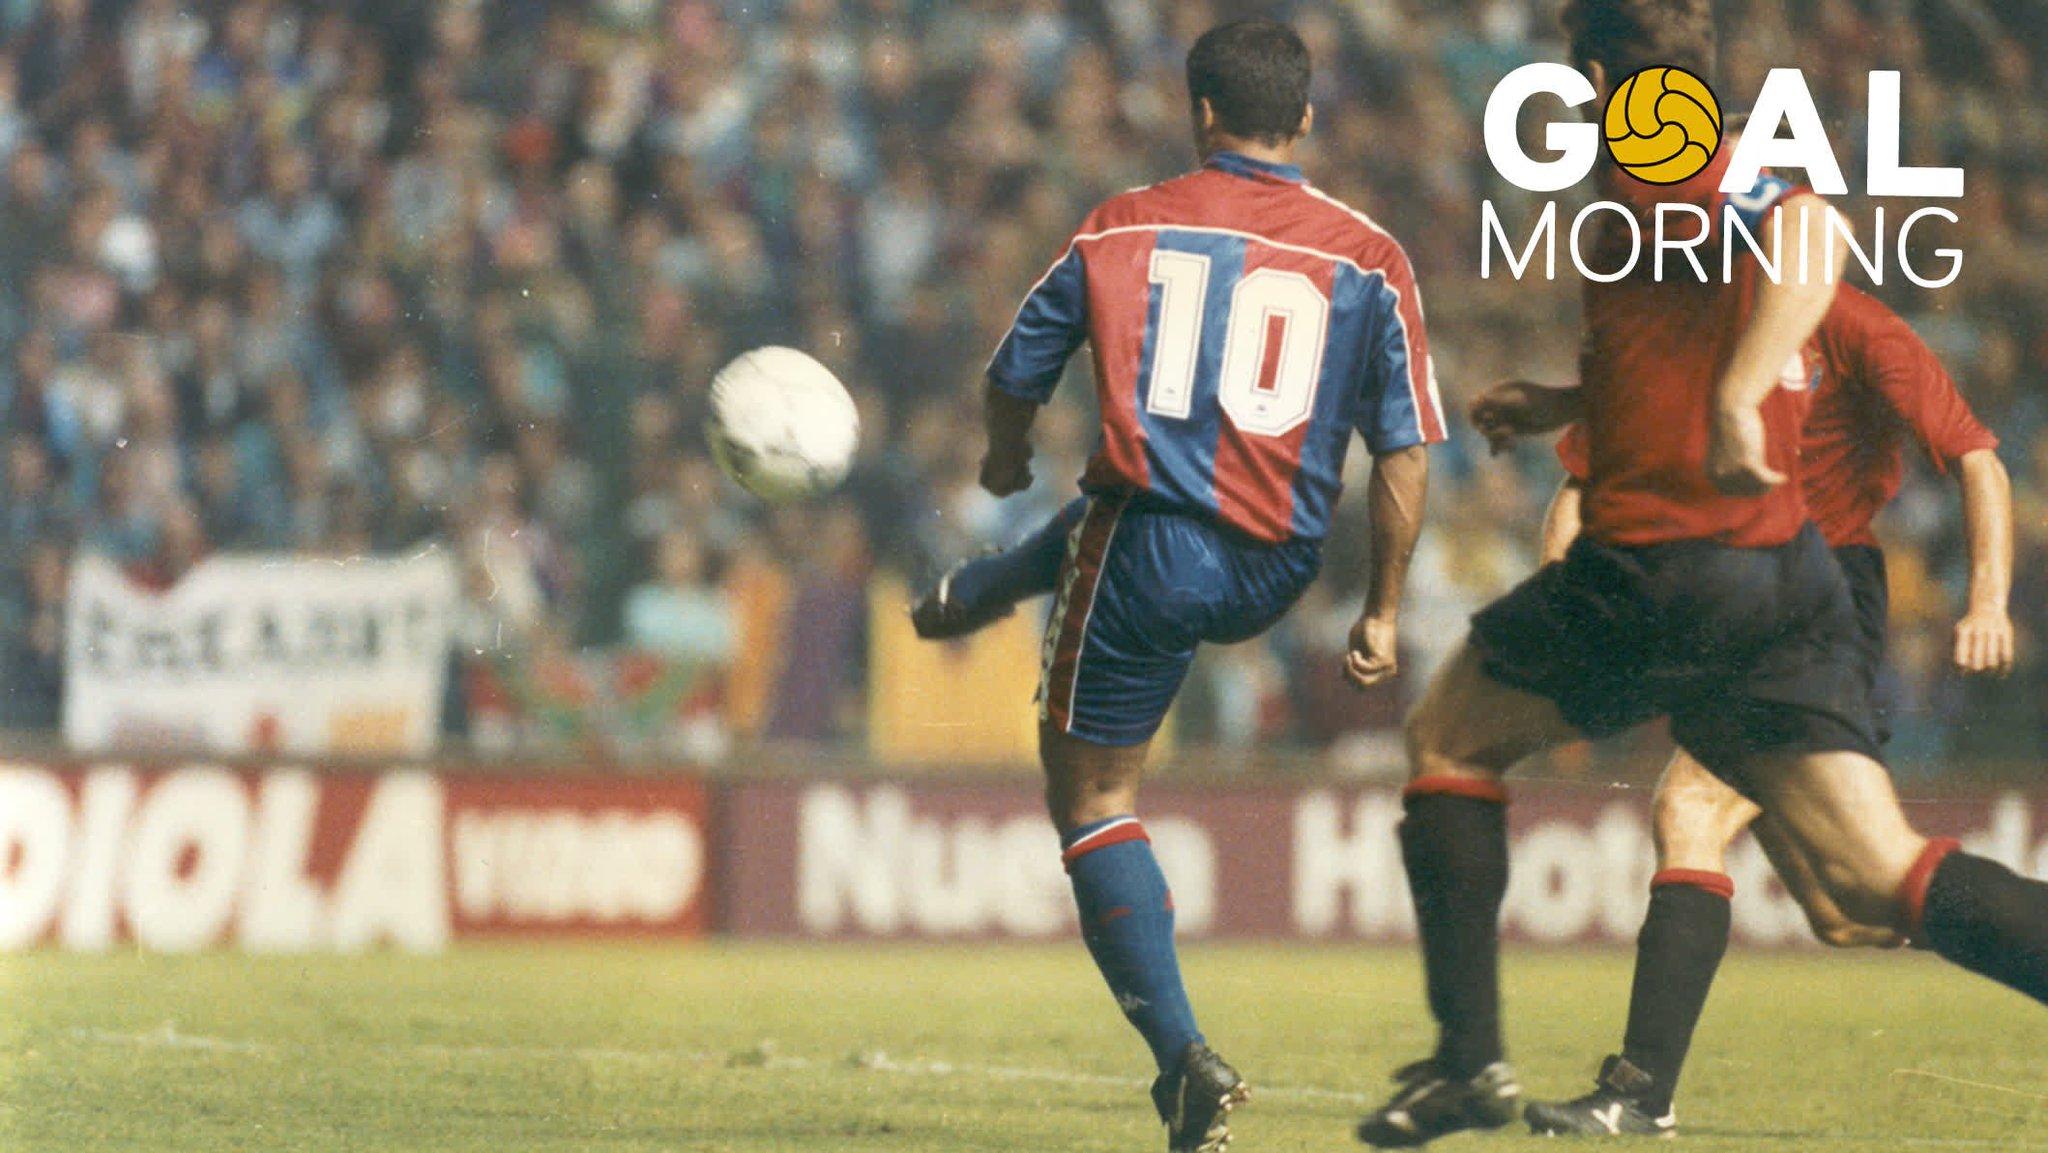 G⚽️AL MORNING!!!  �� Romario, O Rei do Gol ��  @RomarioOnze https://t.co/HtQKrhZNZL